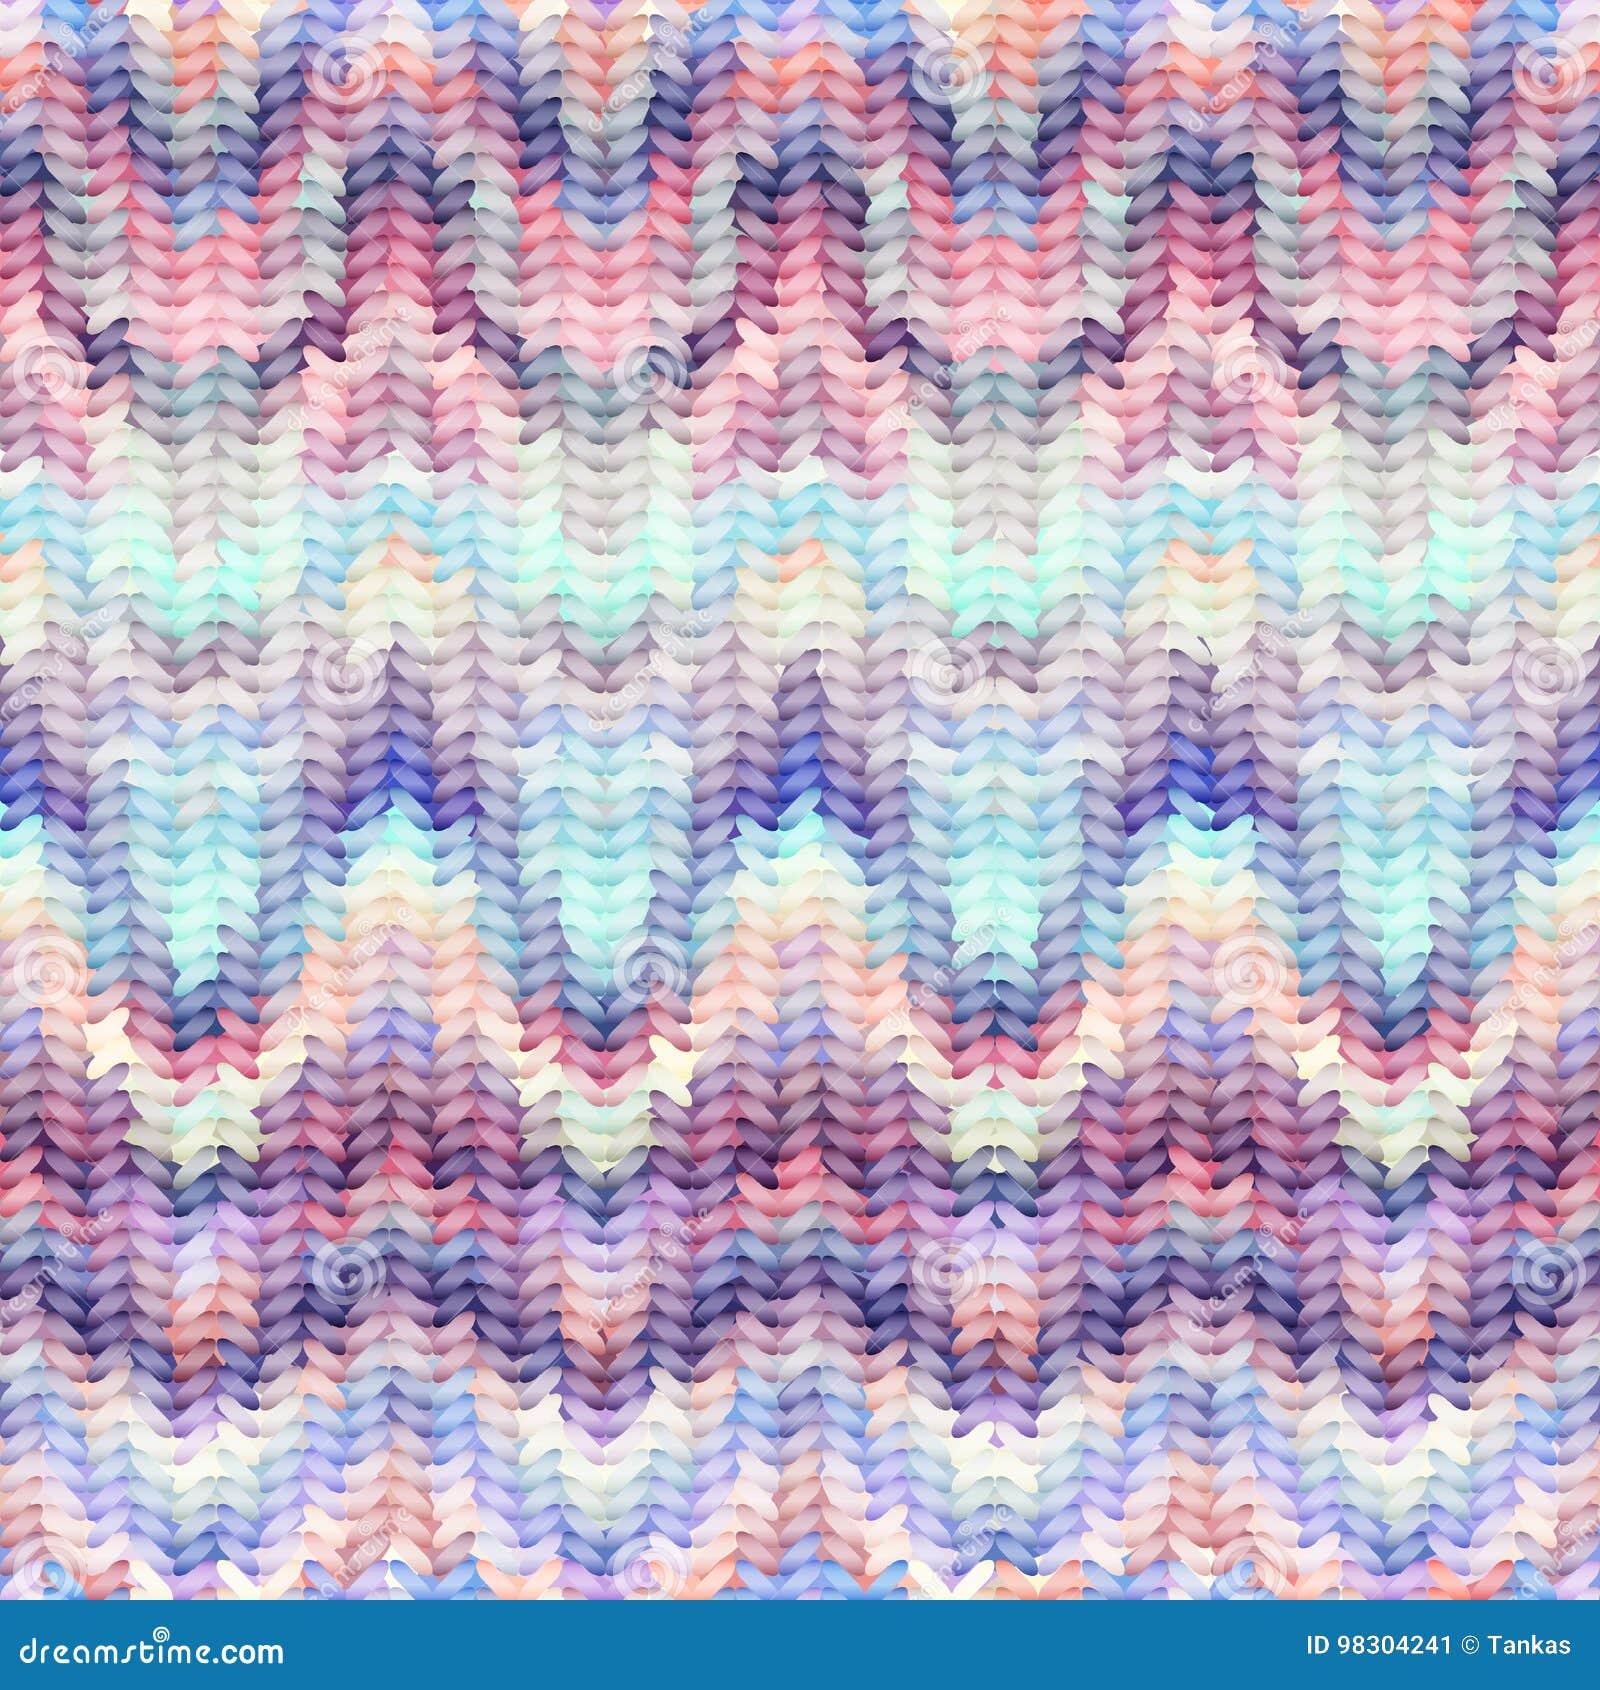 Imitation Sweater Knit Melange Effect Stock Vector - Illustration of ...